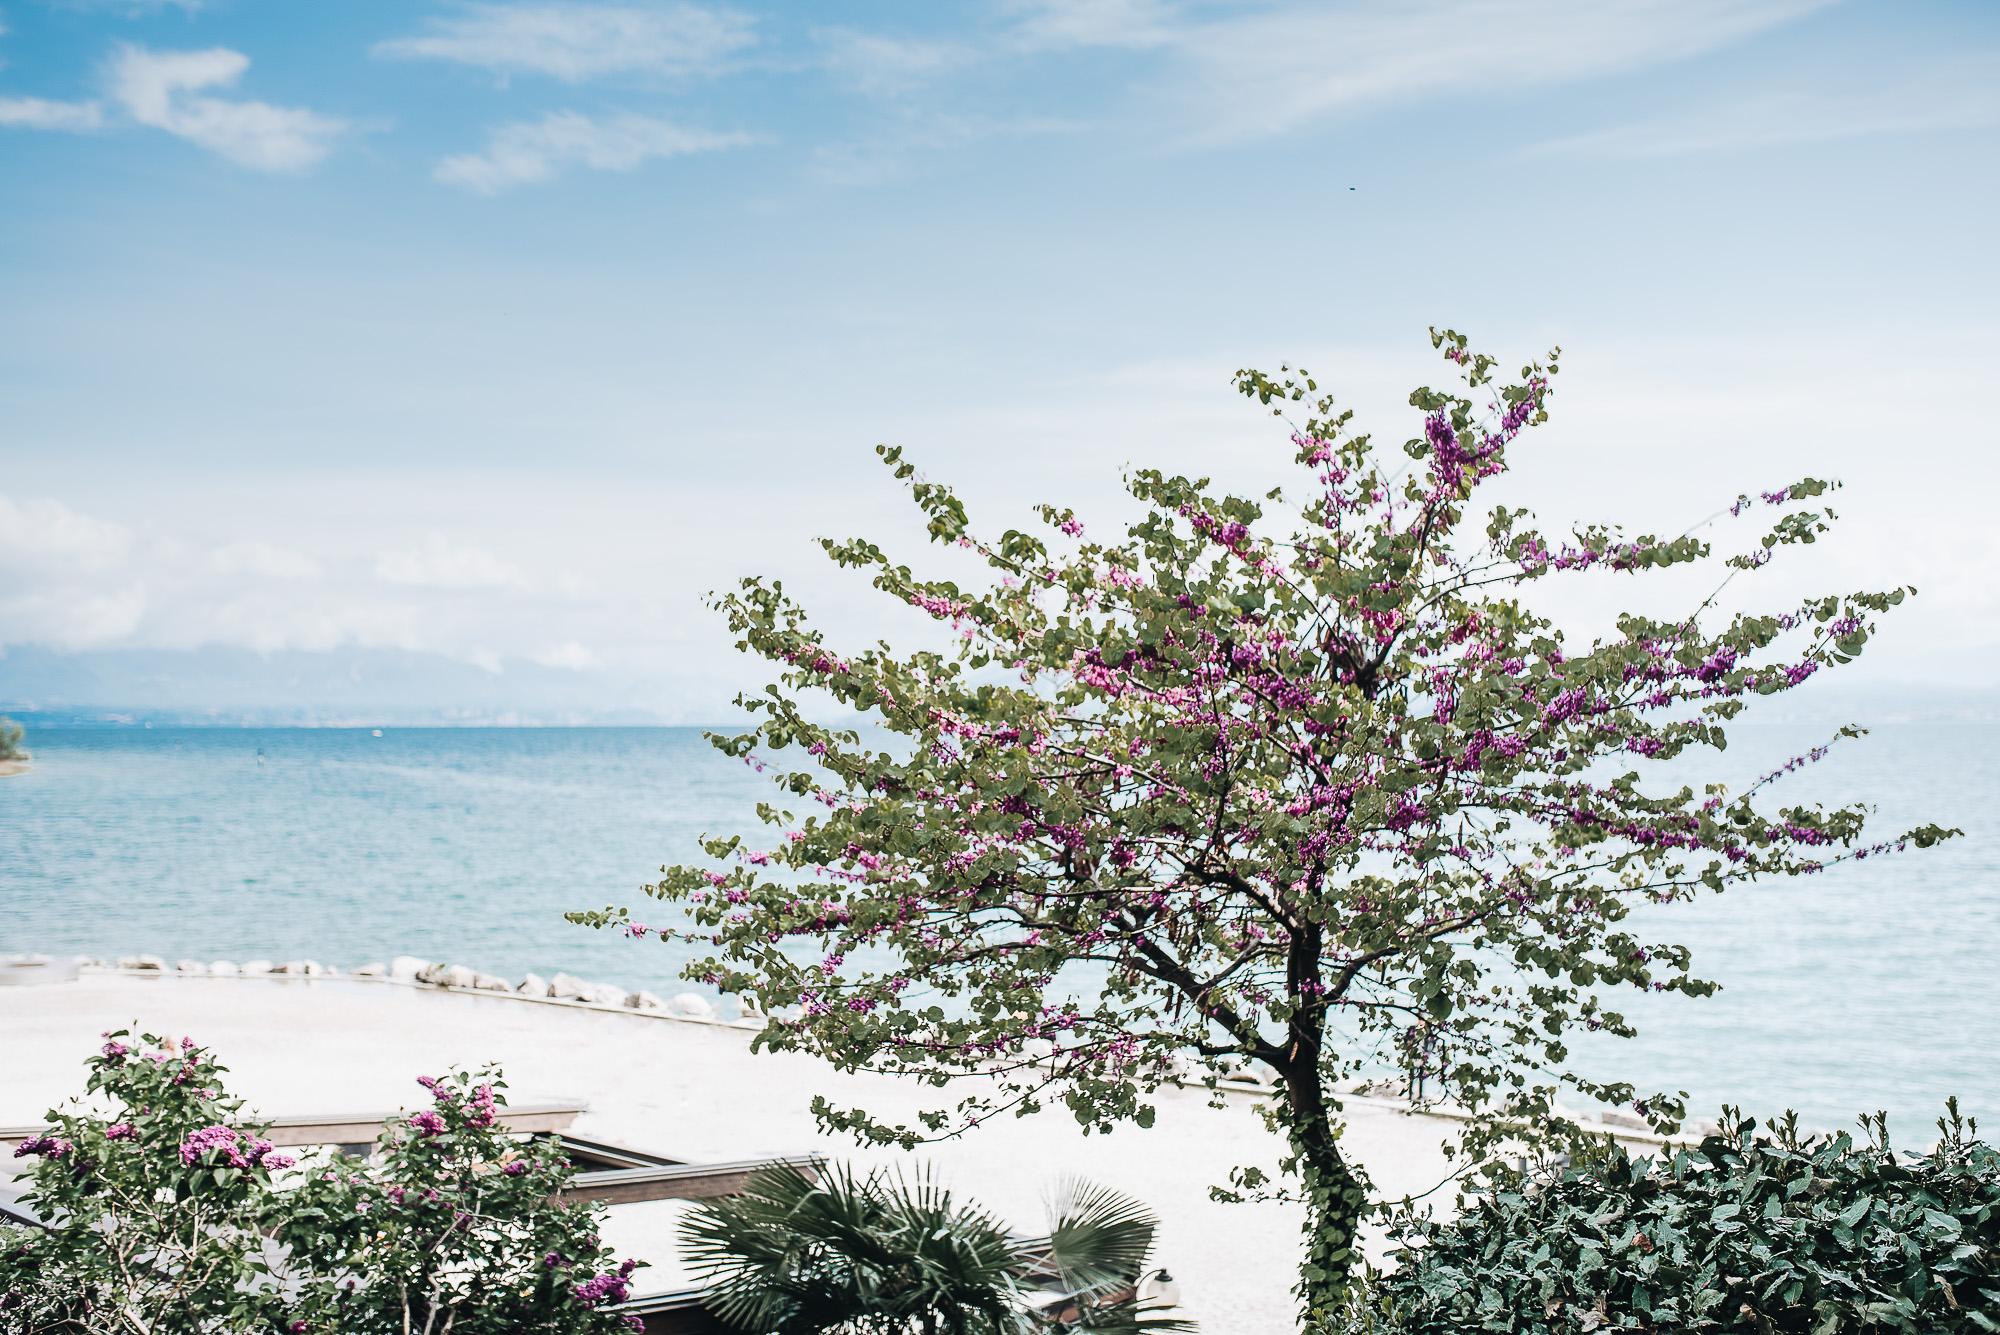 OurBeautifulAdventure-LakeGarda-Italy-Blog-.jpg